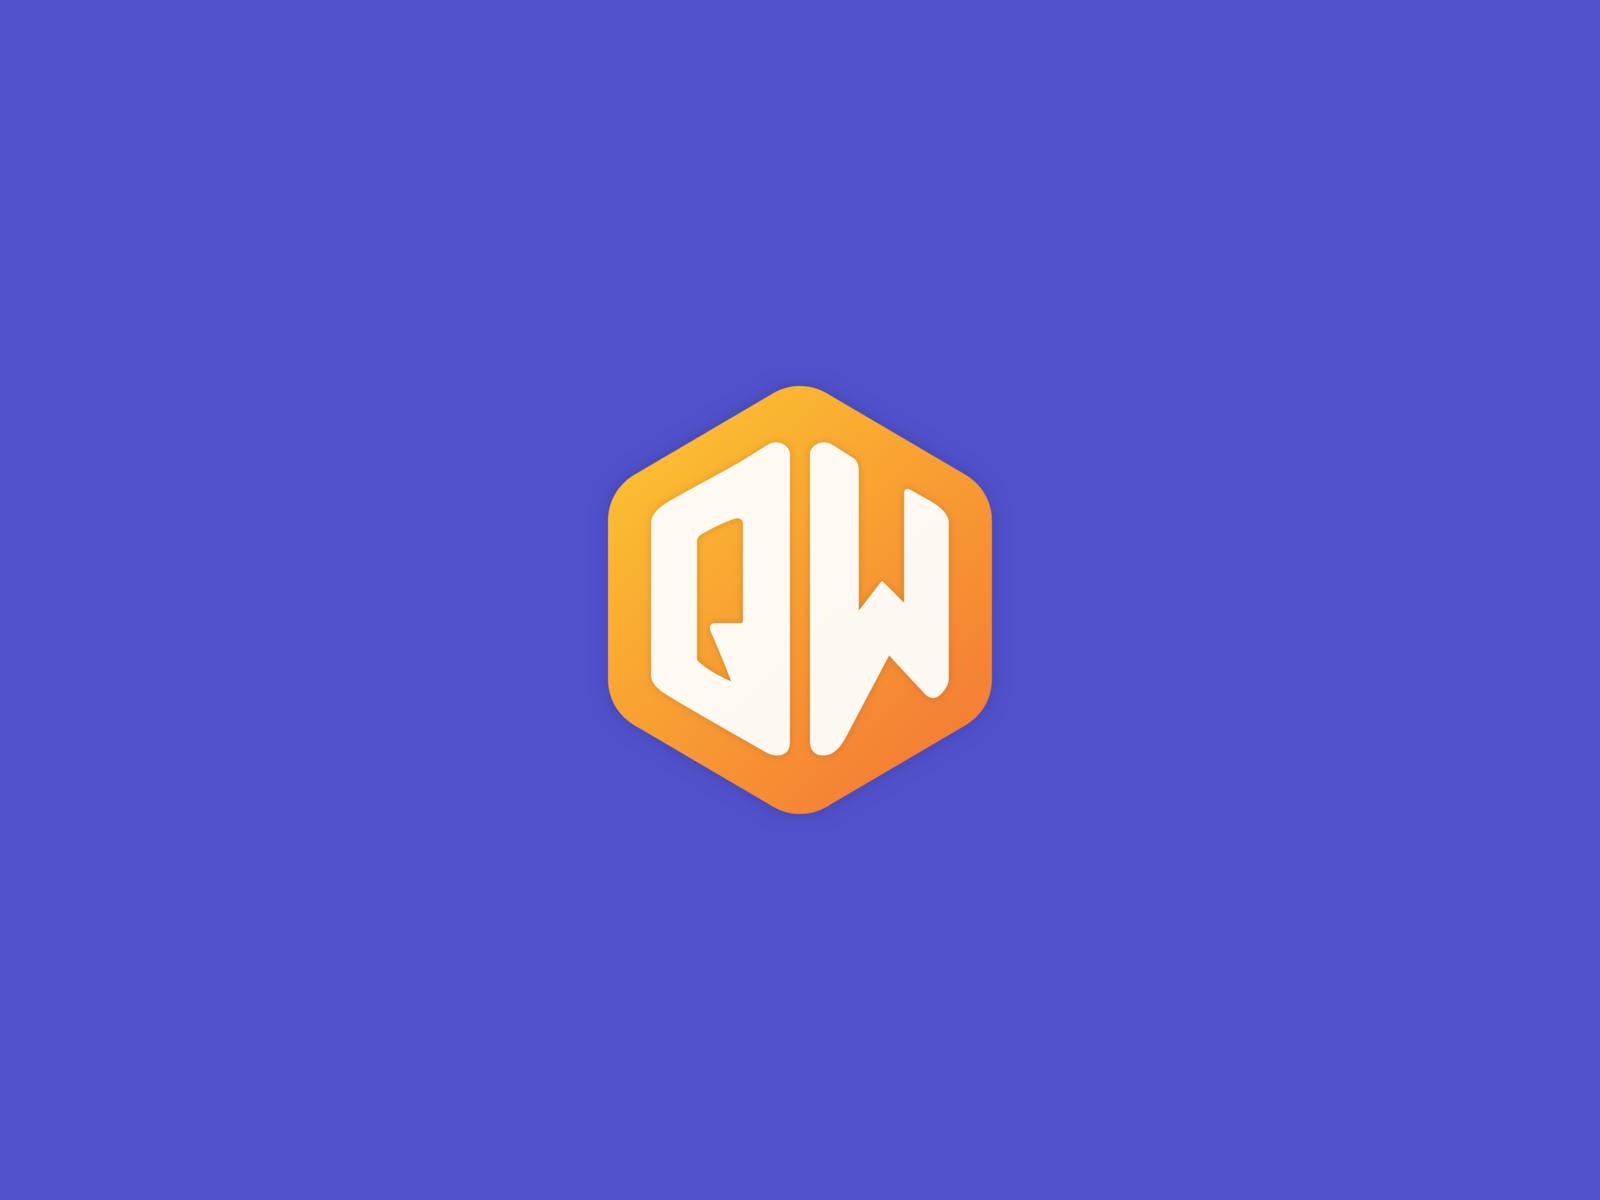 Quack Worlds (Brand Mark)